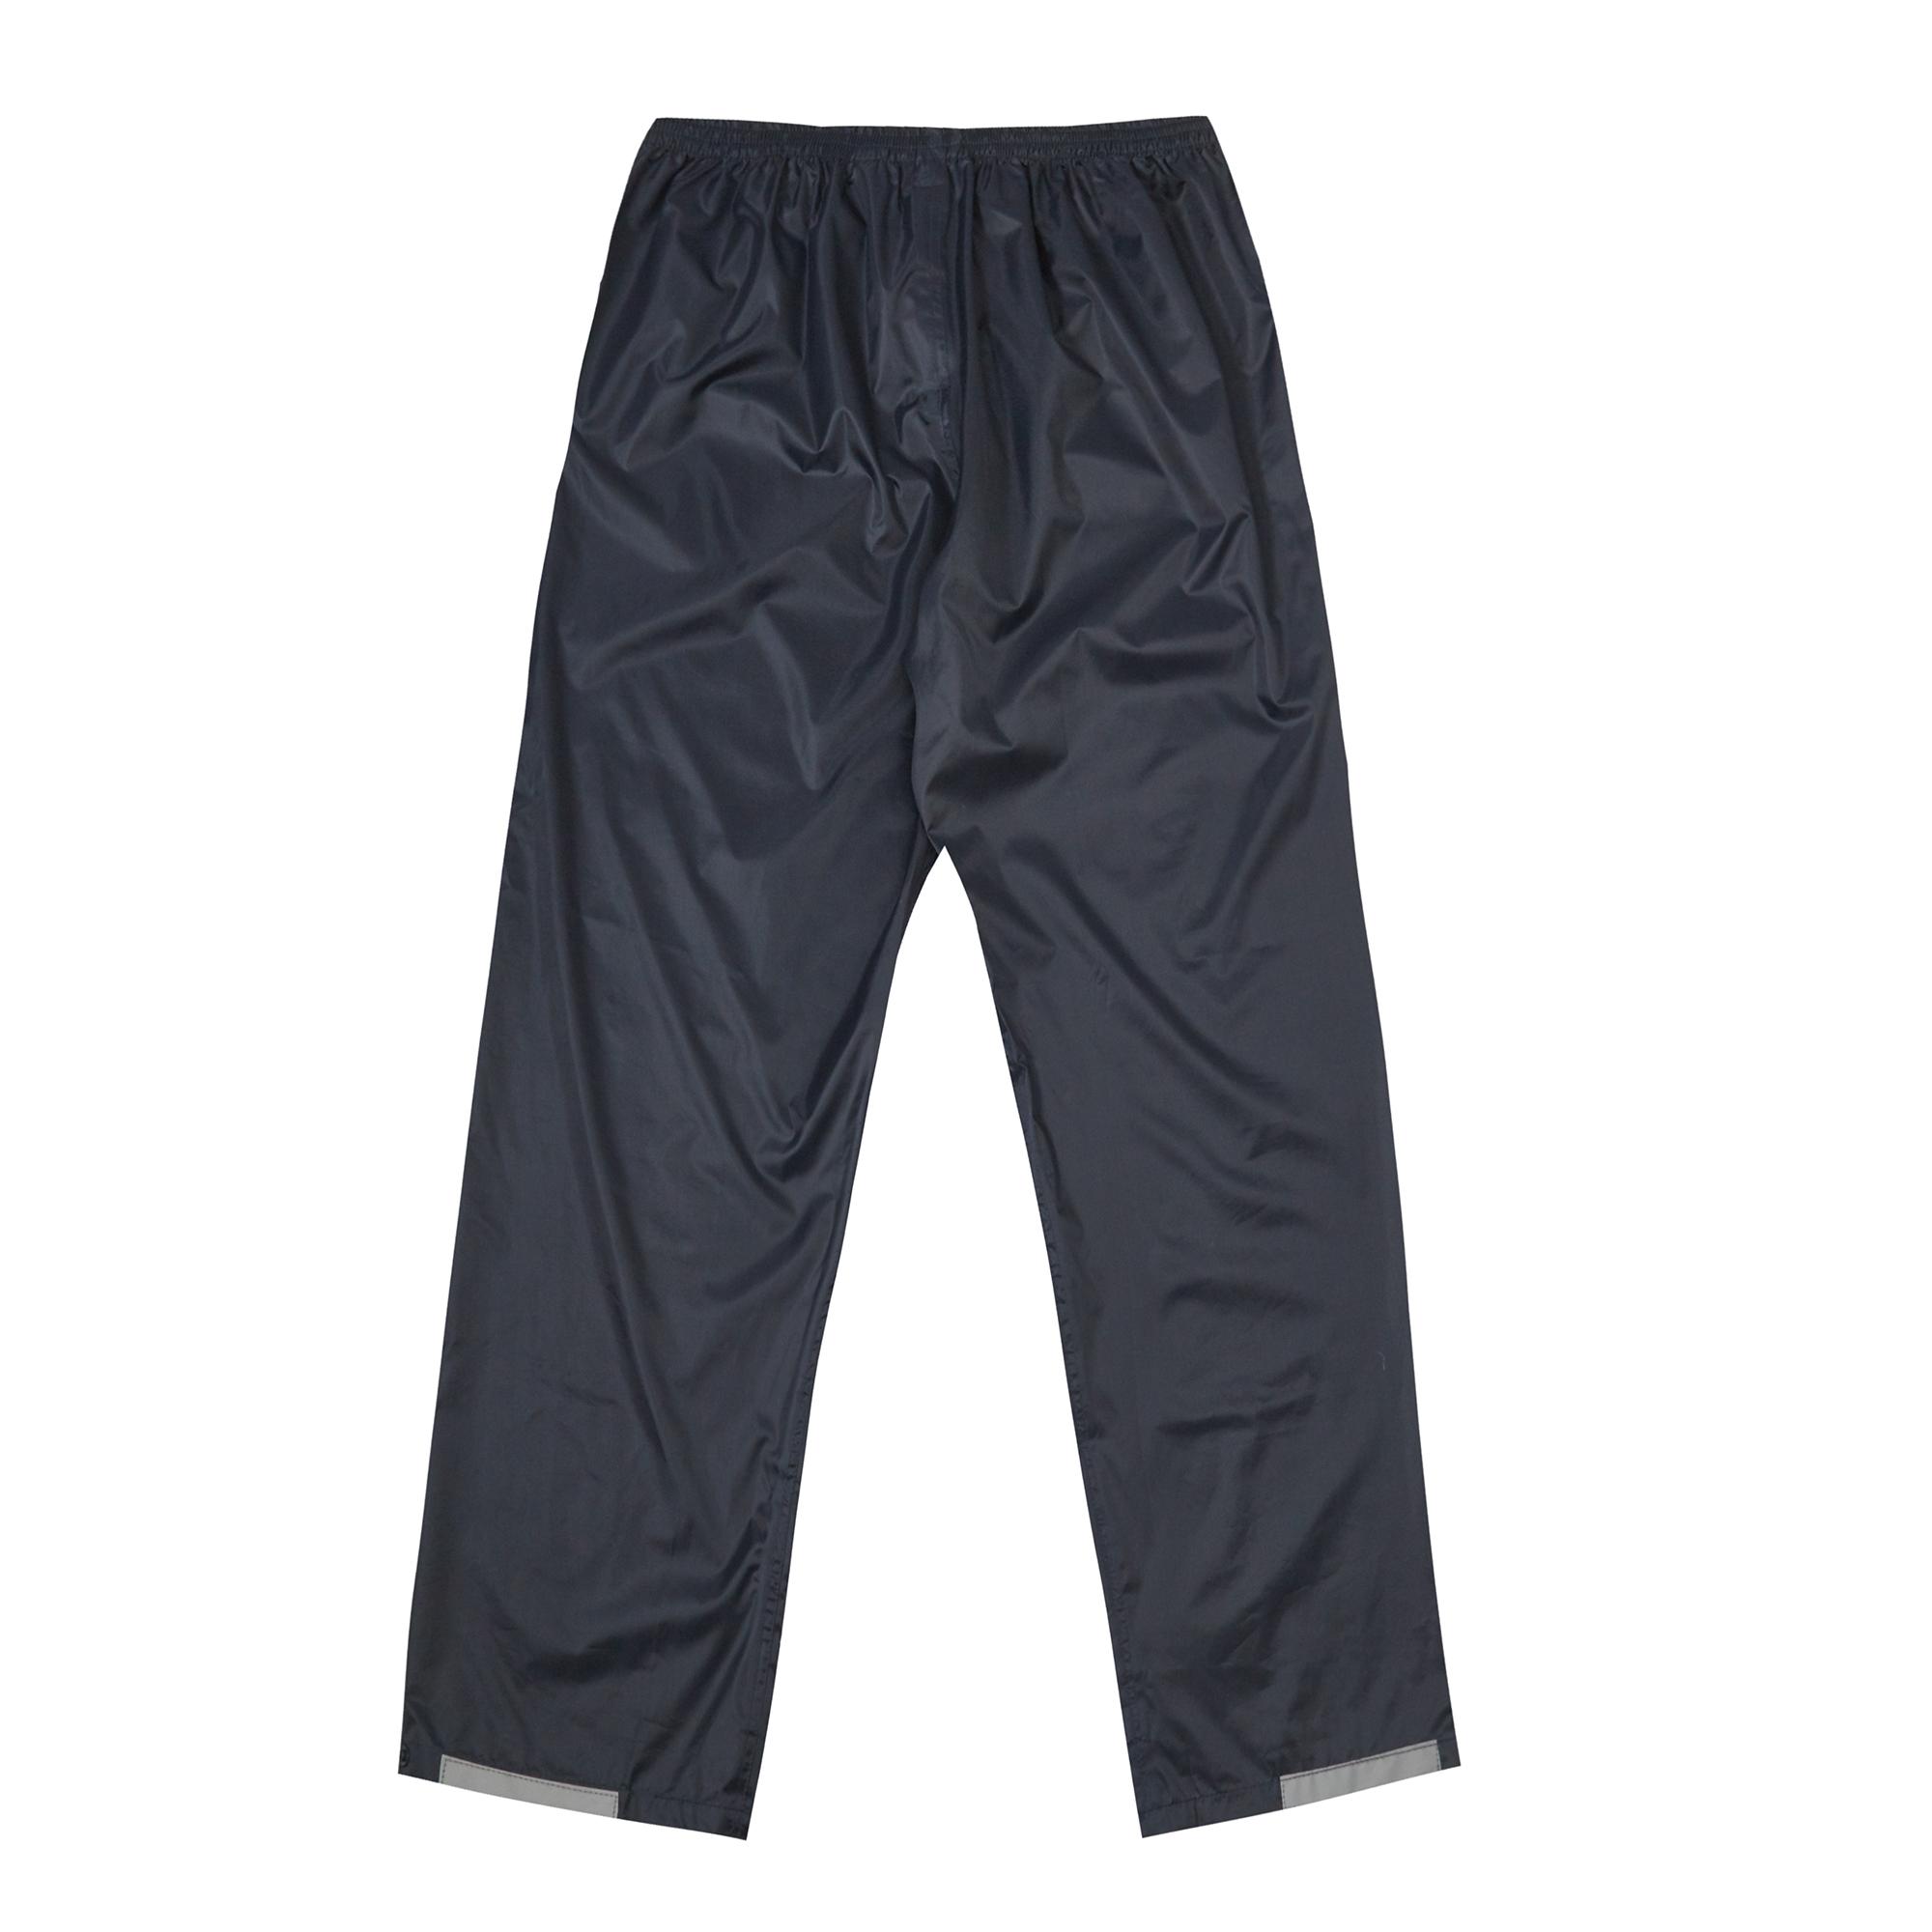 Mens-Waterproof-Water-Rain-Resitant-Pants-Bottoms-Overtrousers-Motorbike-S-XXL miniatuur 8